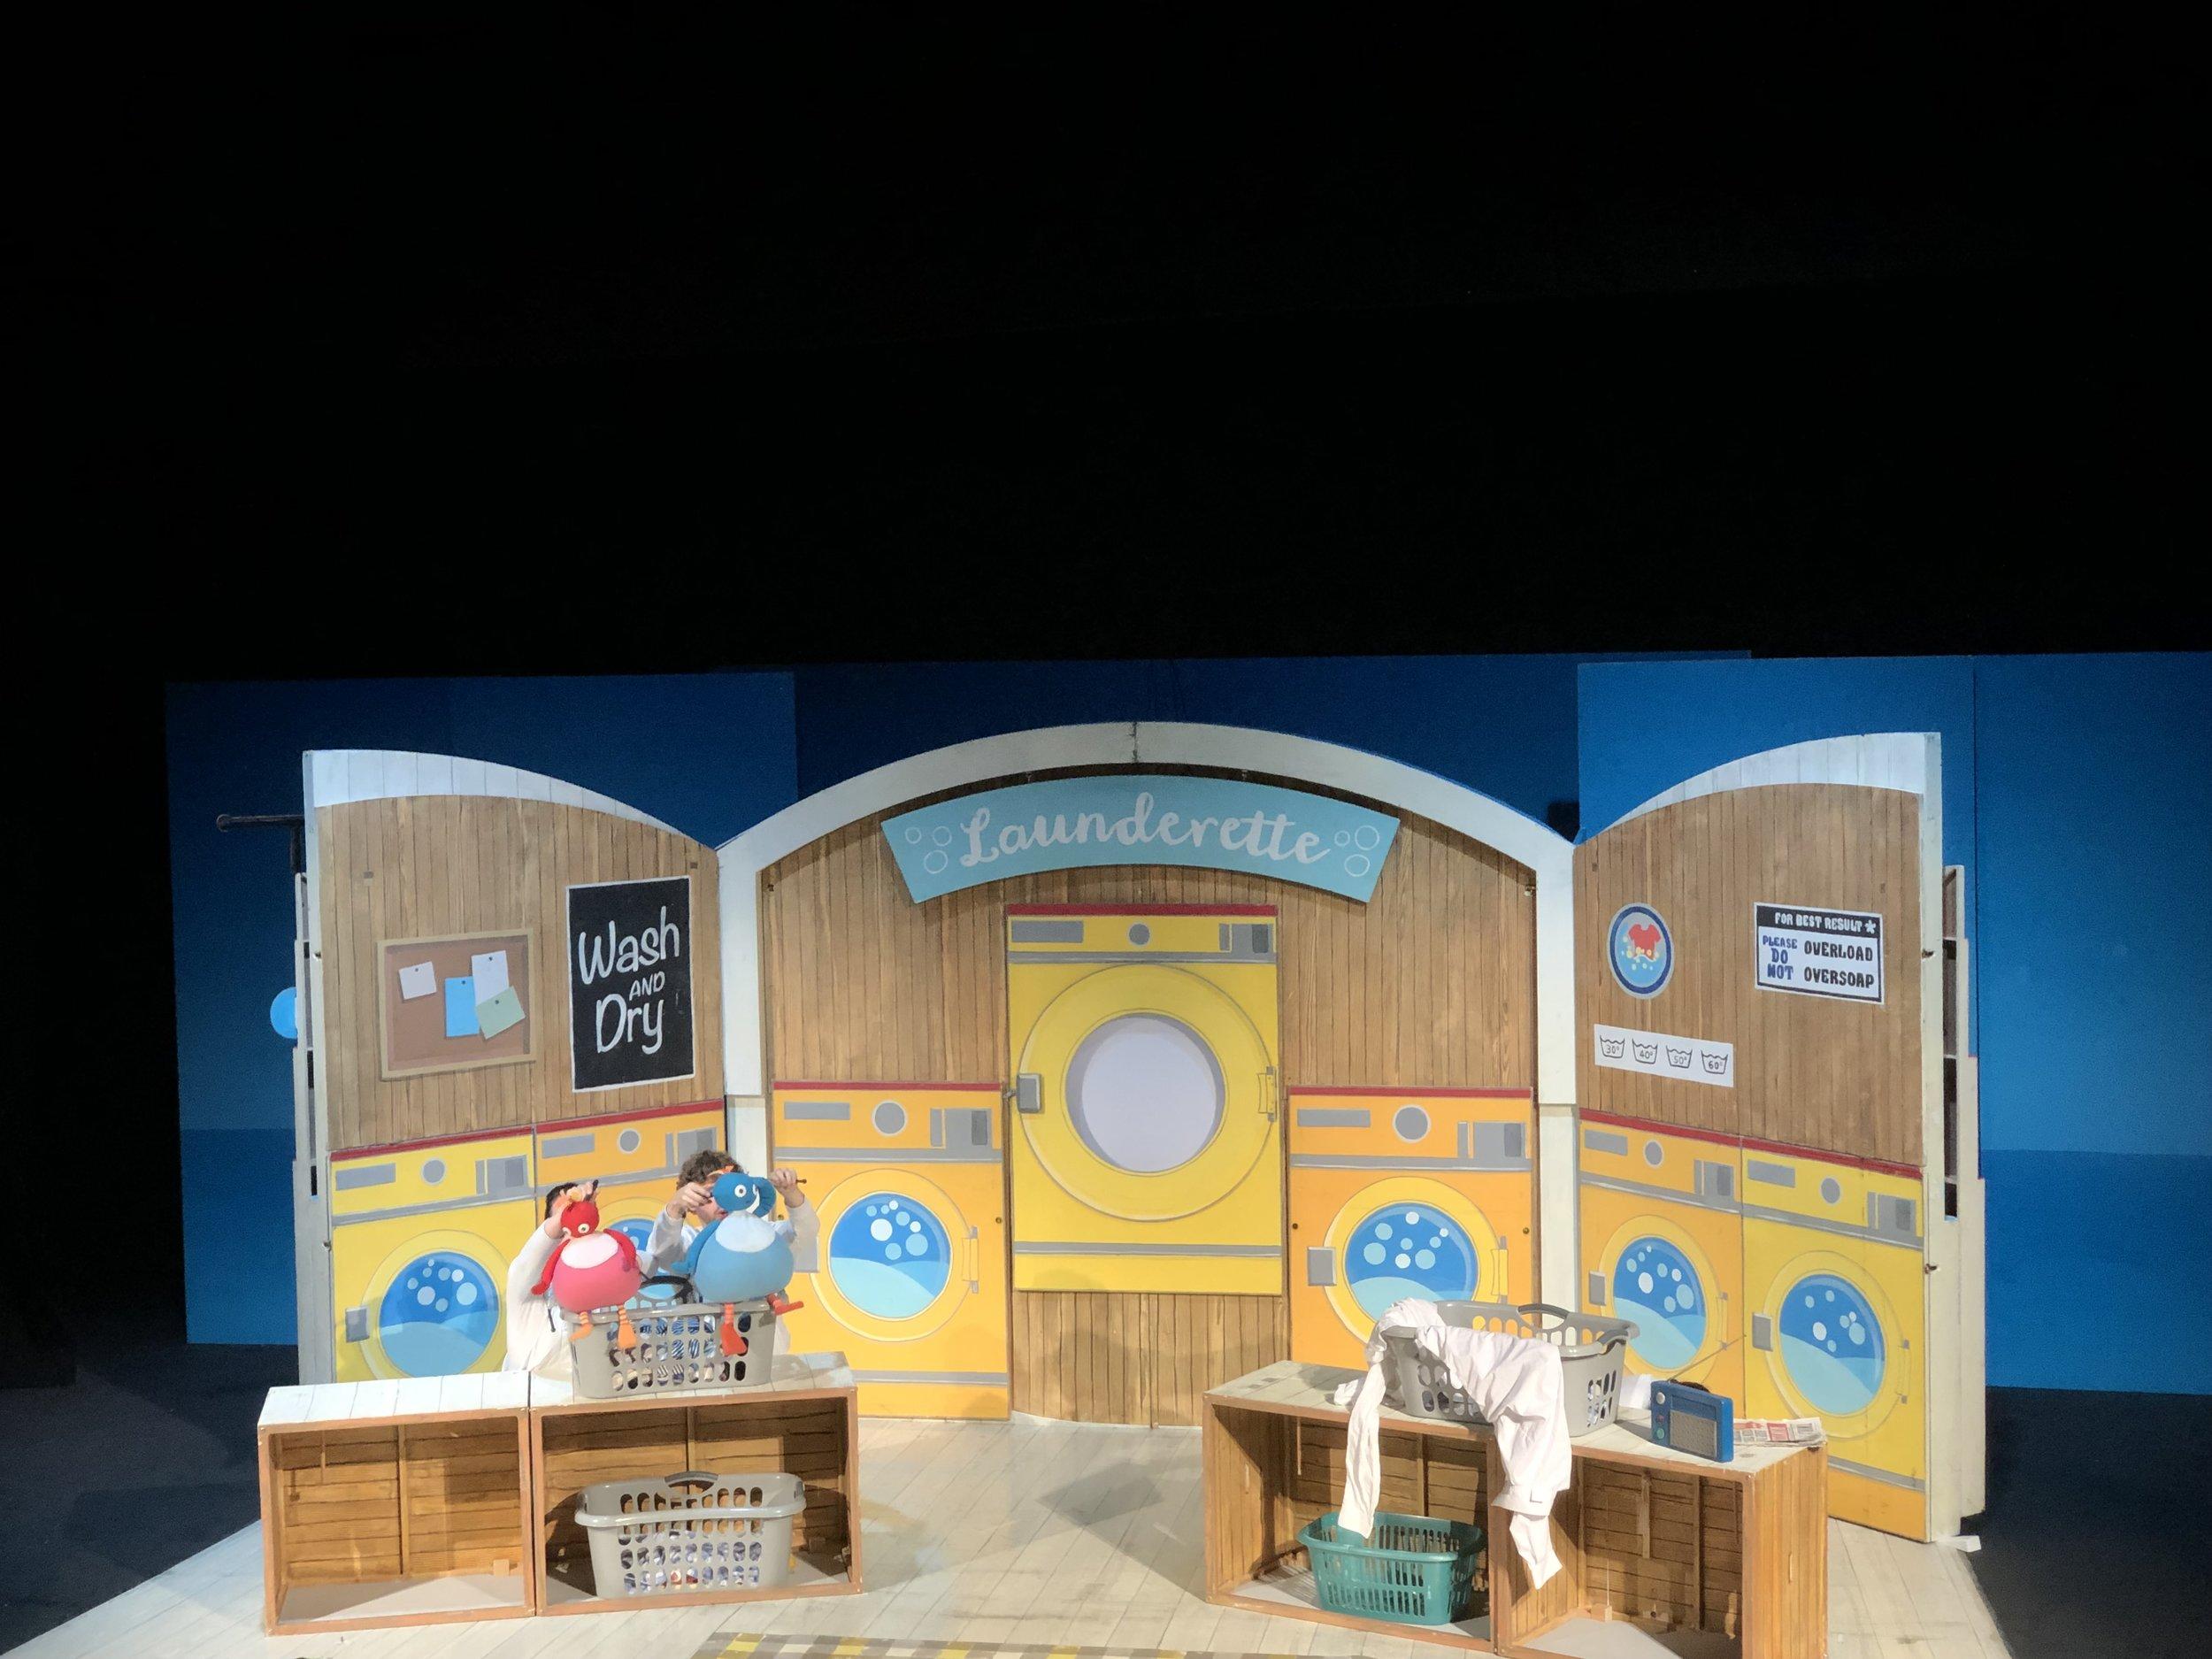 twirlywoos-live-theatre-pre-schooler-under-fives-day-out-kent-tunbridge-wells-support-local-magazine.jpg-9-8.jpg